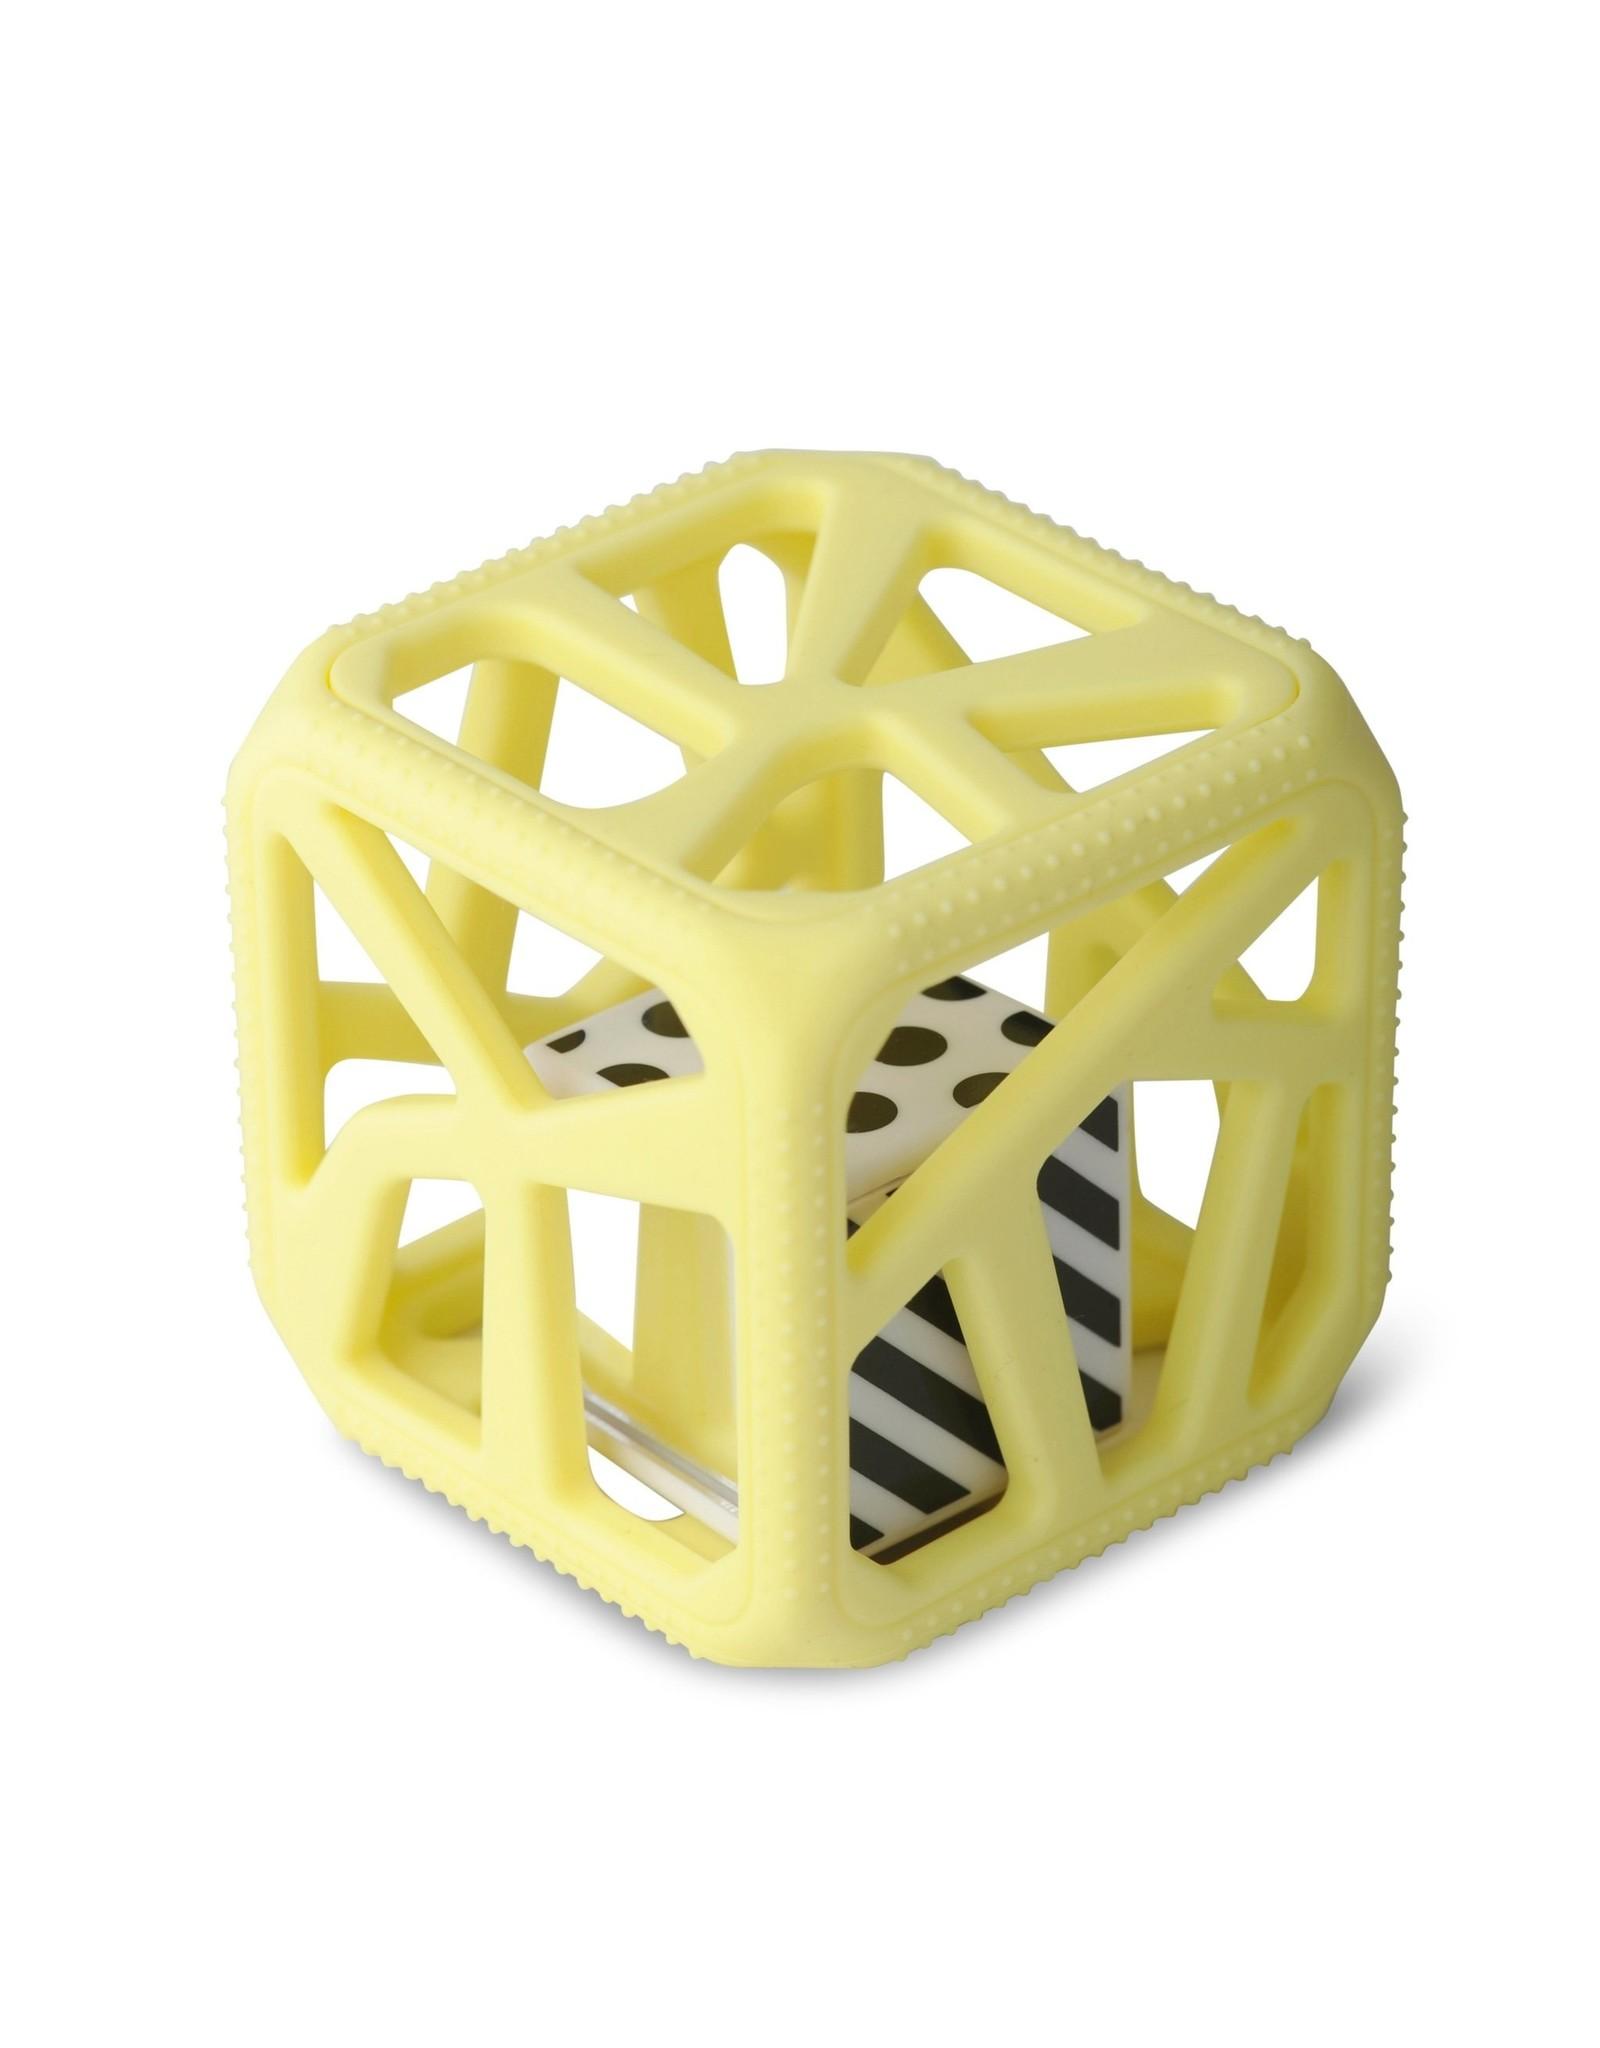 Malarkey Kids Malarkey Kids- Chew Cube: Yellow